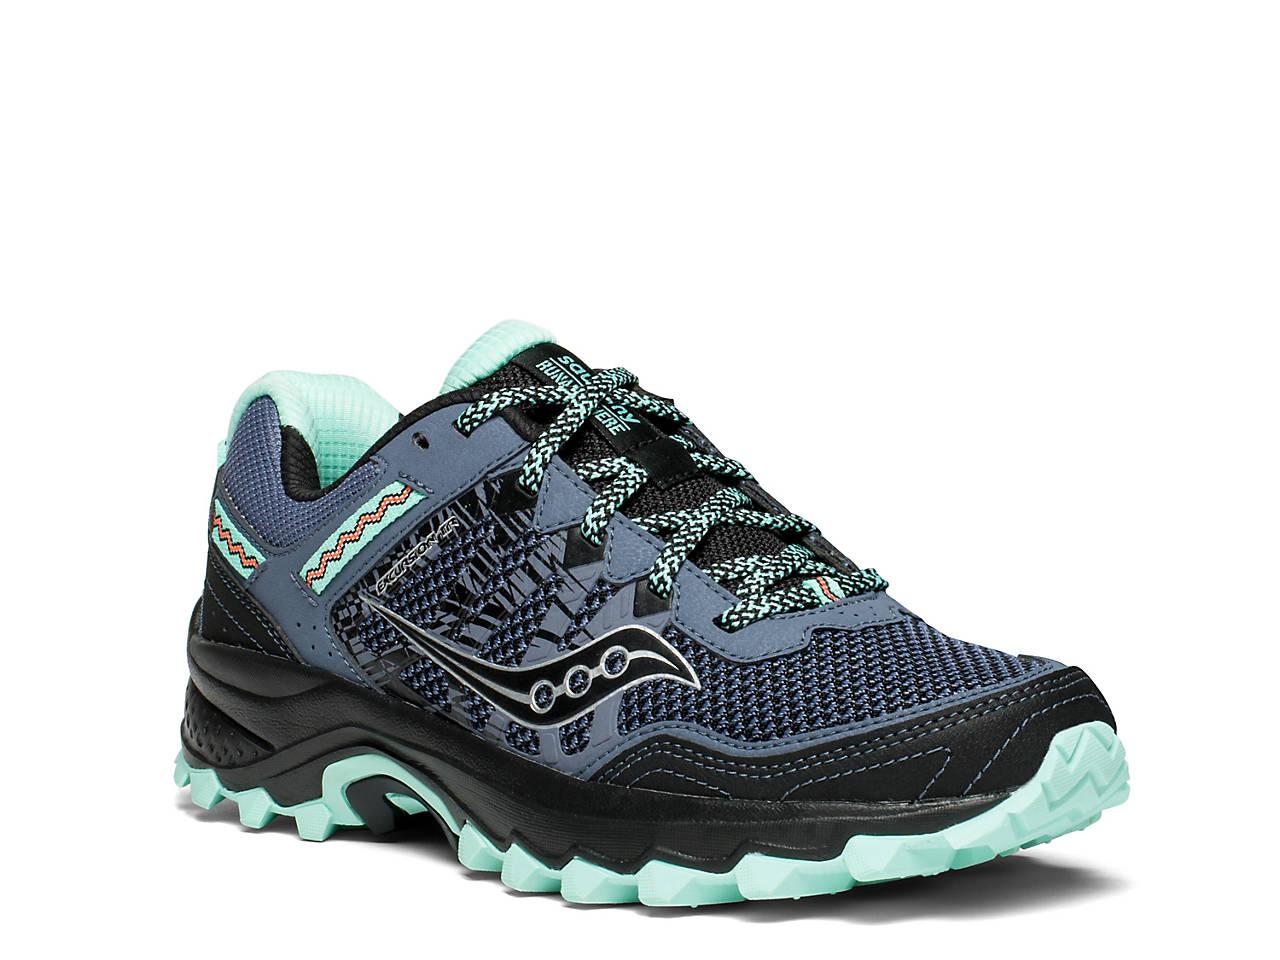 c32ff630 Excursion TR 12 Running Shoe - Women's